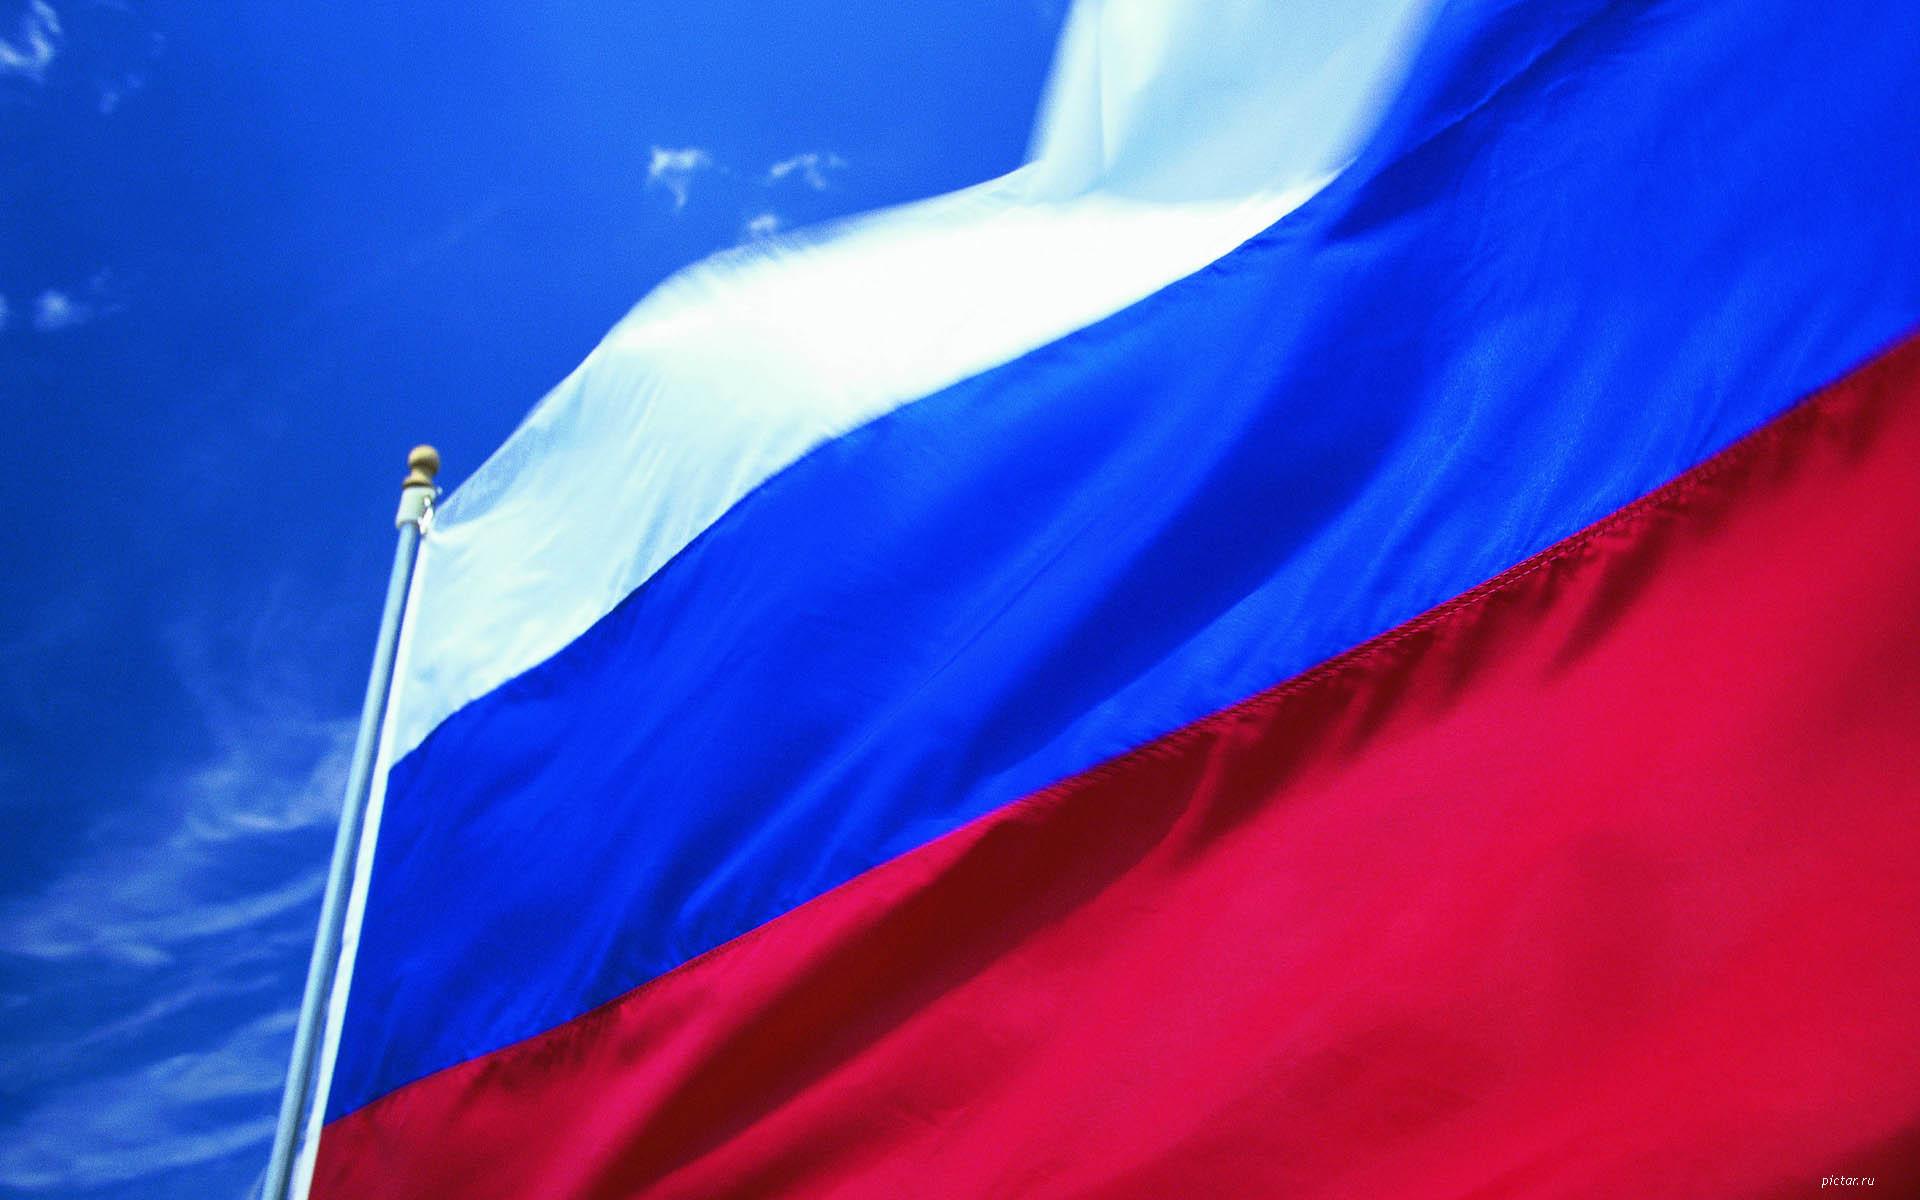 развивающийся флаг россии картинка